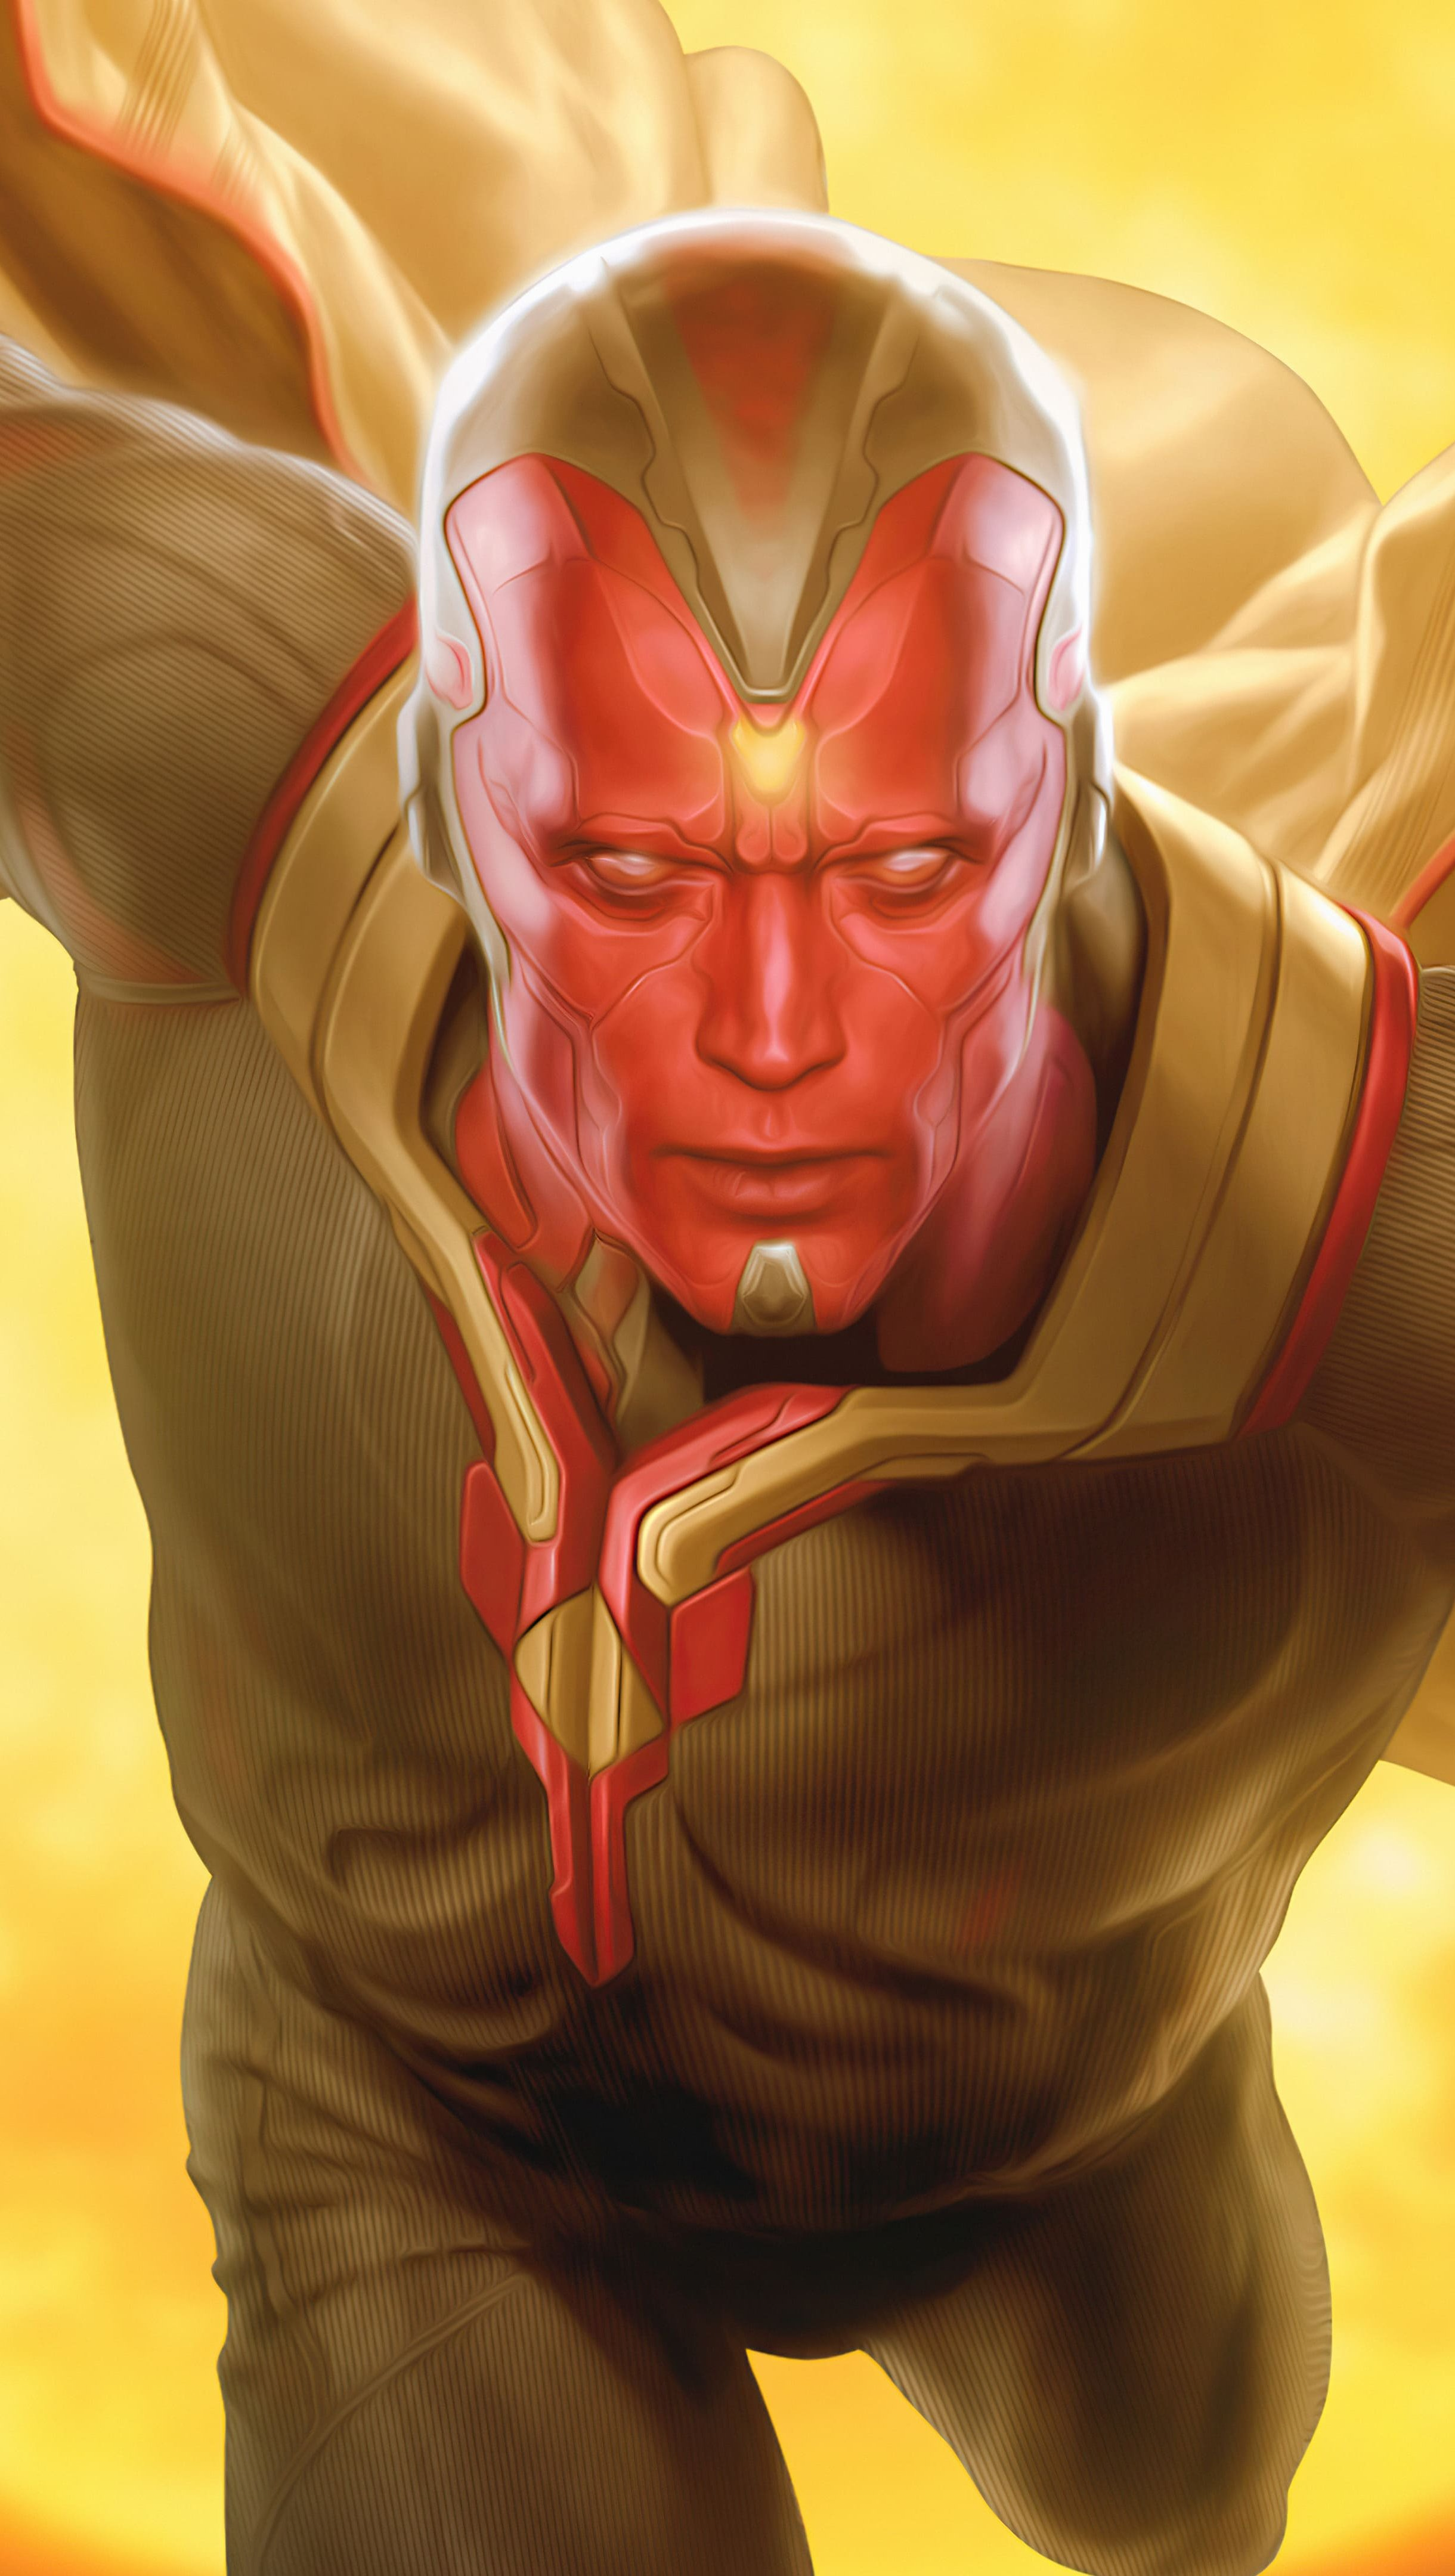 Fondos de pantalla Vision Marvel Artwork Vertical